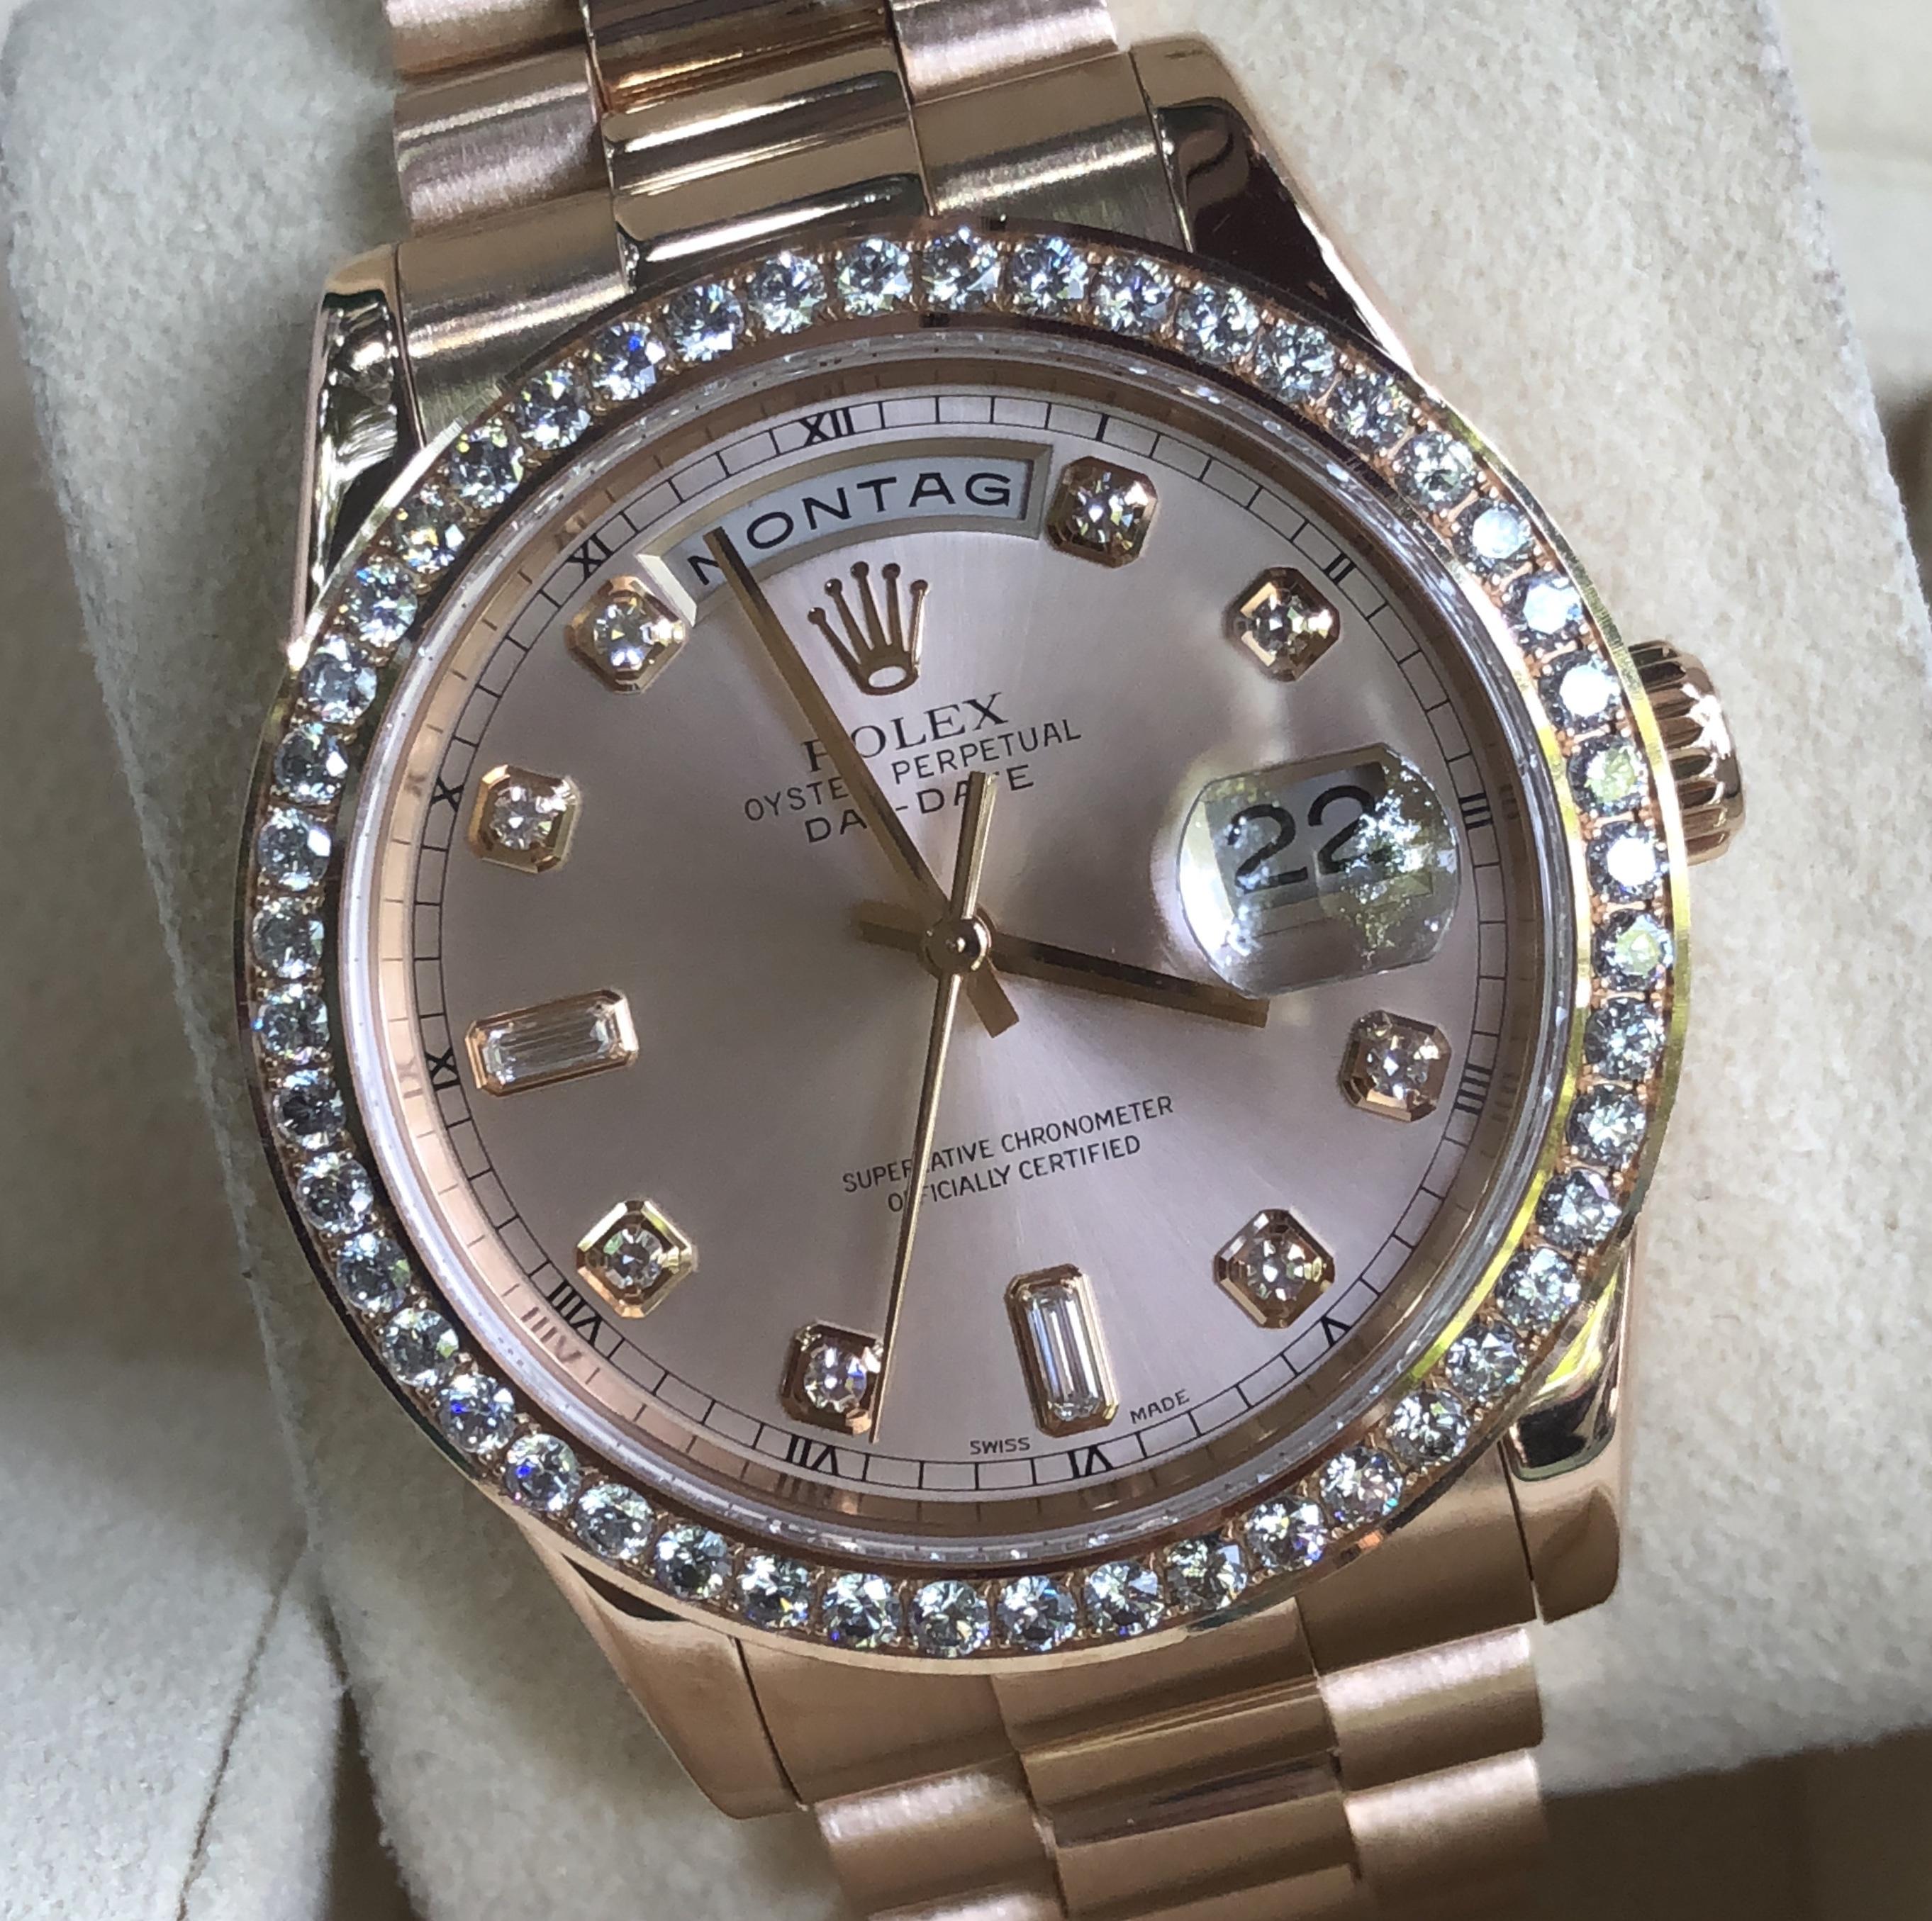 Rolex Day-Date Ref.118205 vàng hồng khối 18k đời 2003